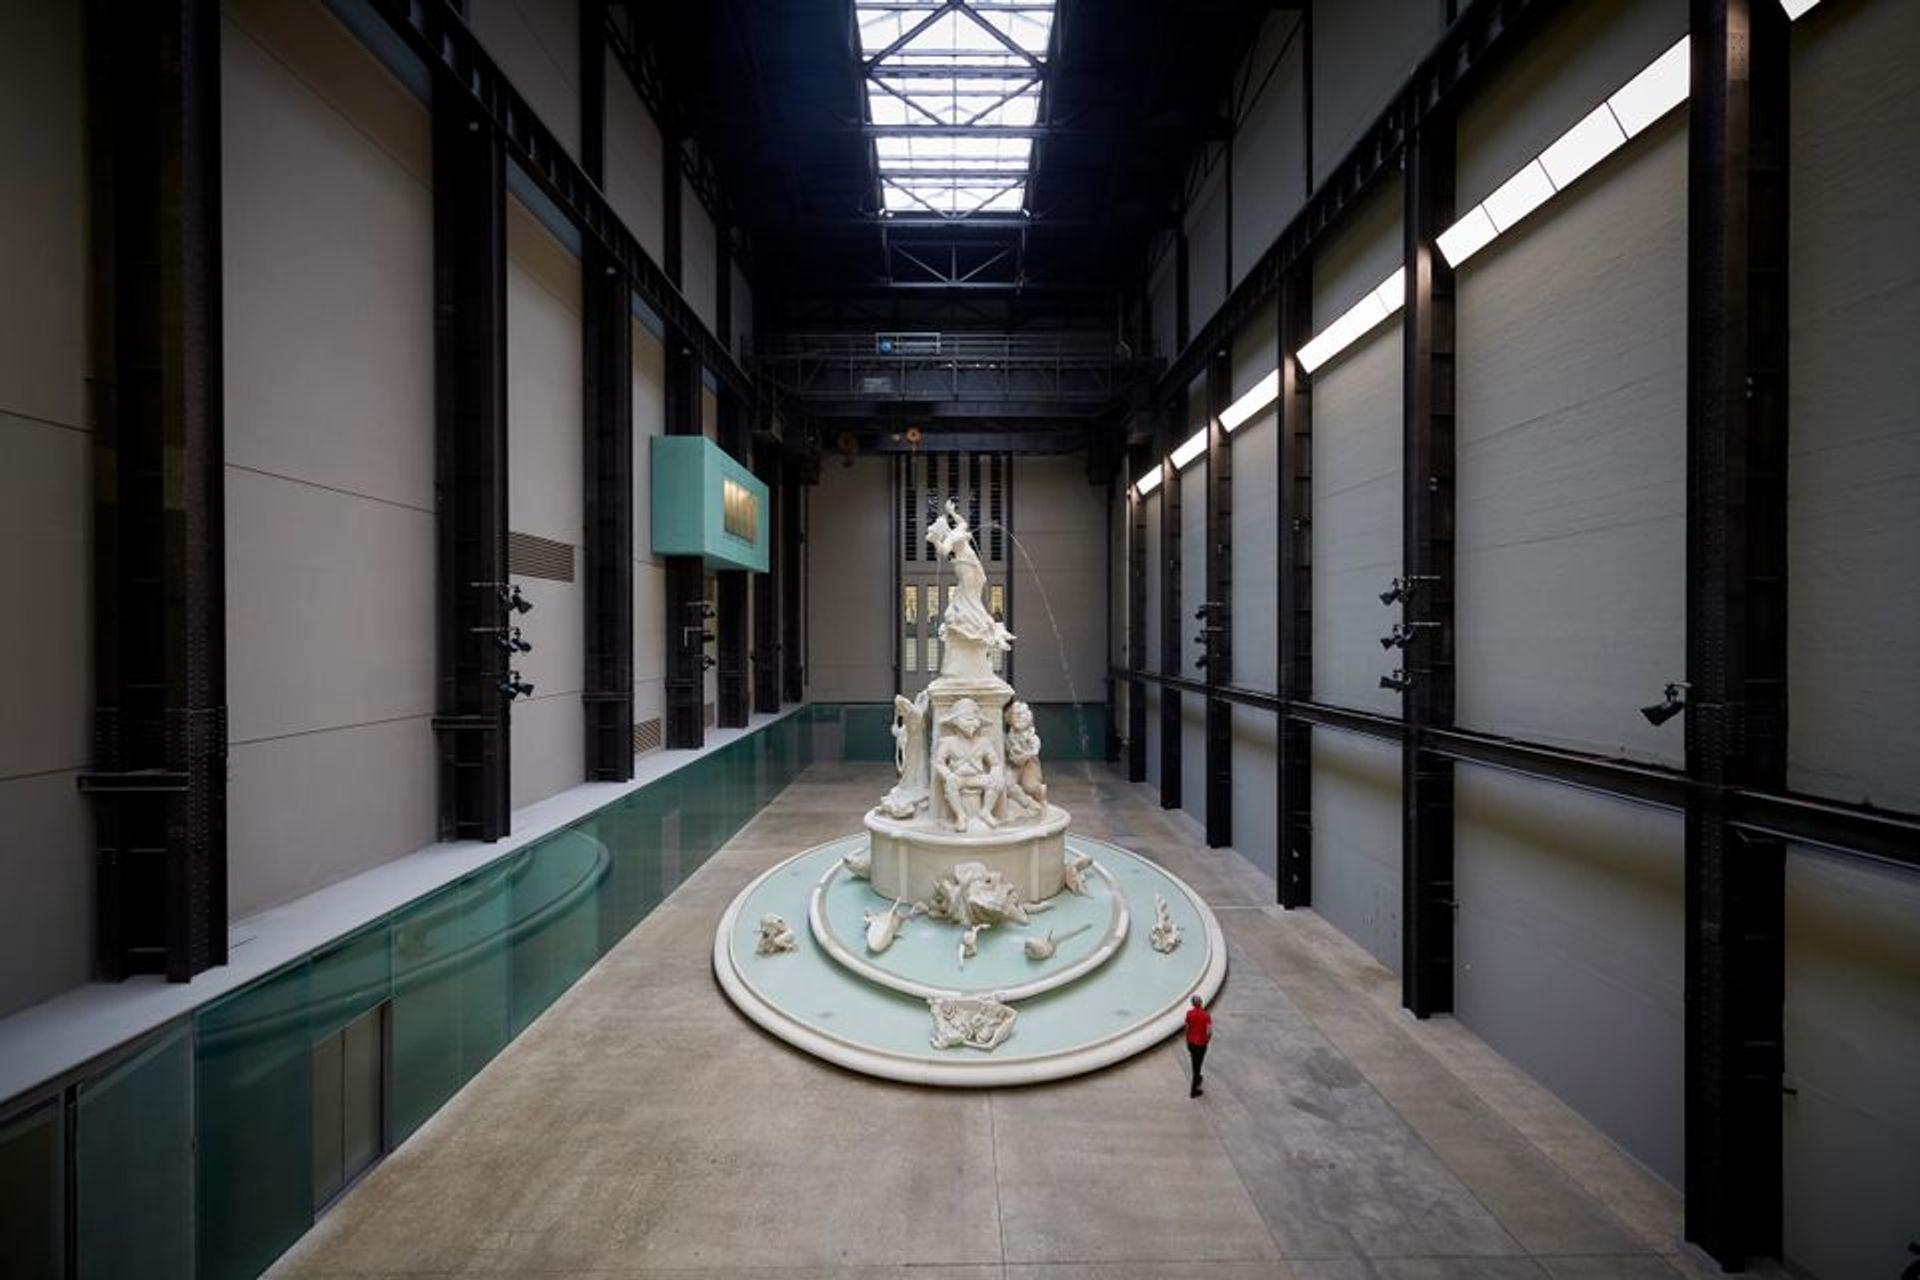 Kara Walker's monumental fountain Fons Americanus, on show at Tate Modern in London Photo: Ben Fisher